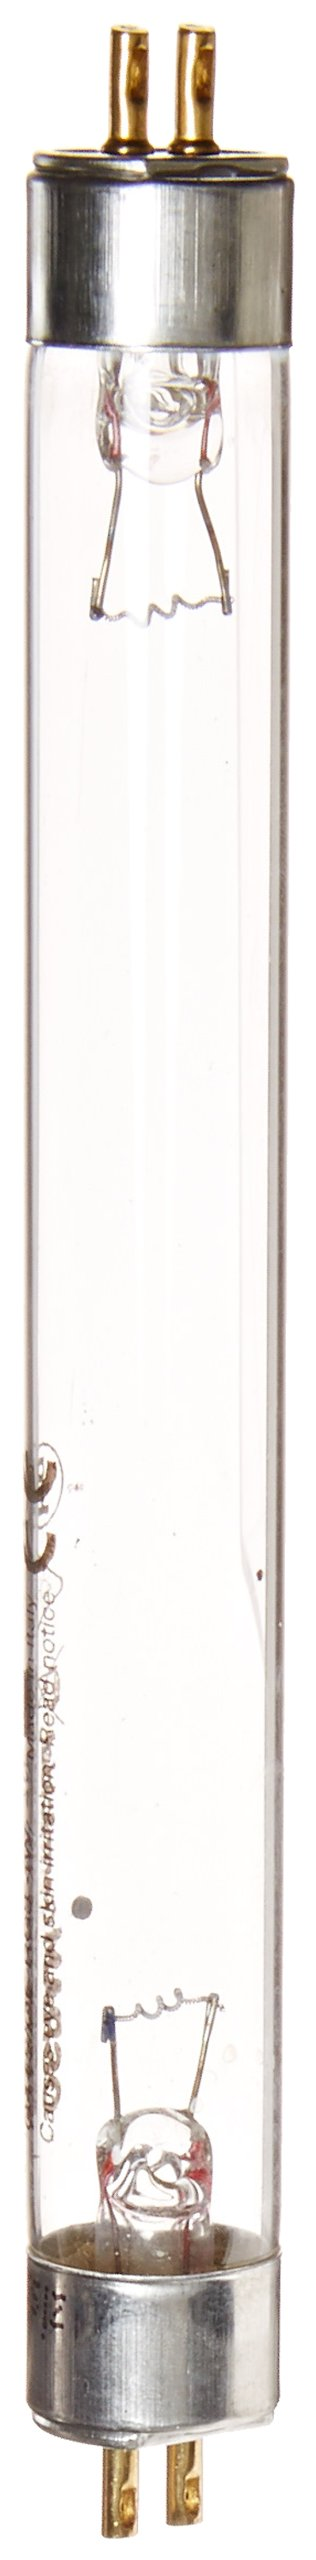 UVP 34-0003-01 Replacement UV Tube for EL Series UV Lamps, 5.314'' Length, 254nm Shortwave, 4W